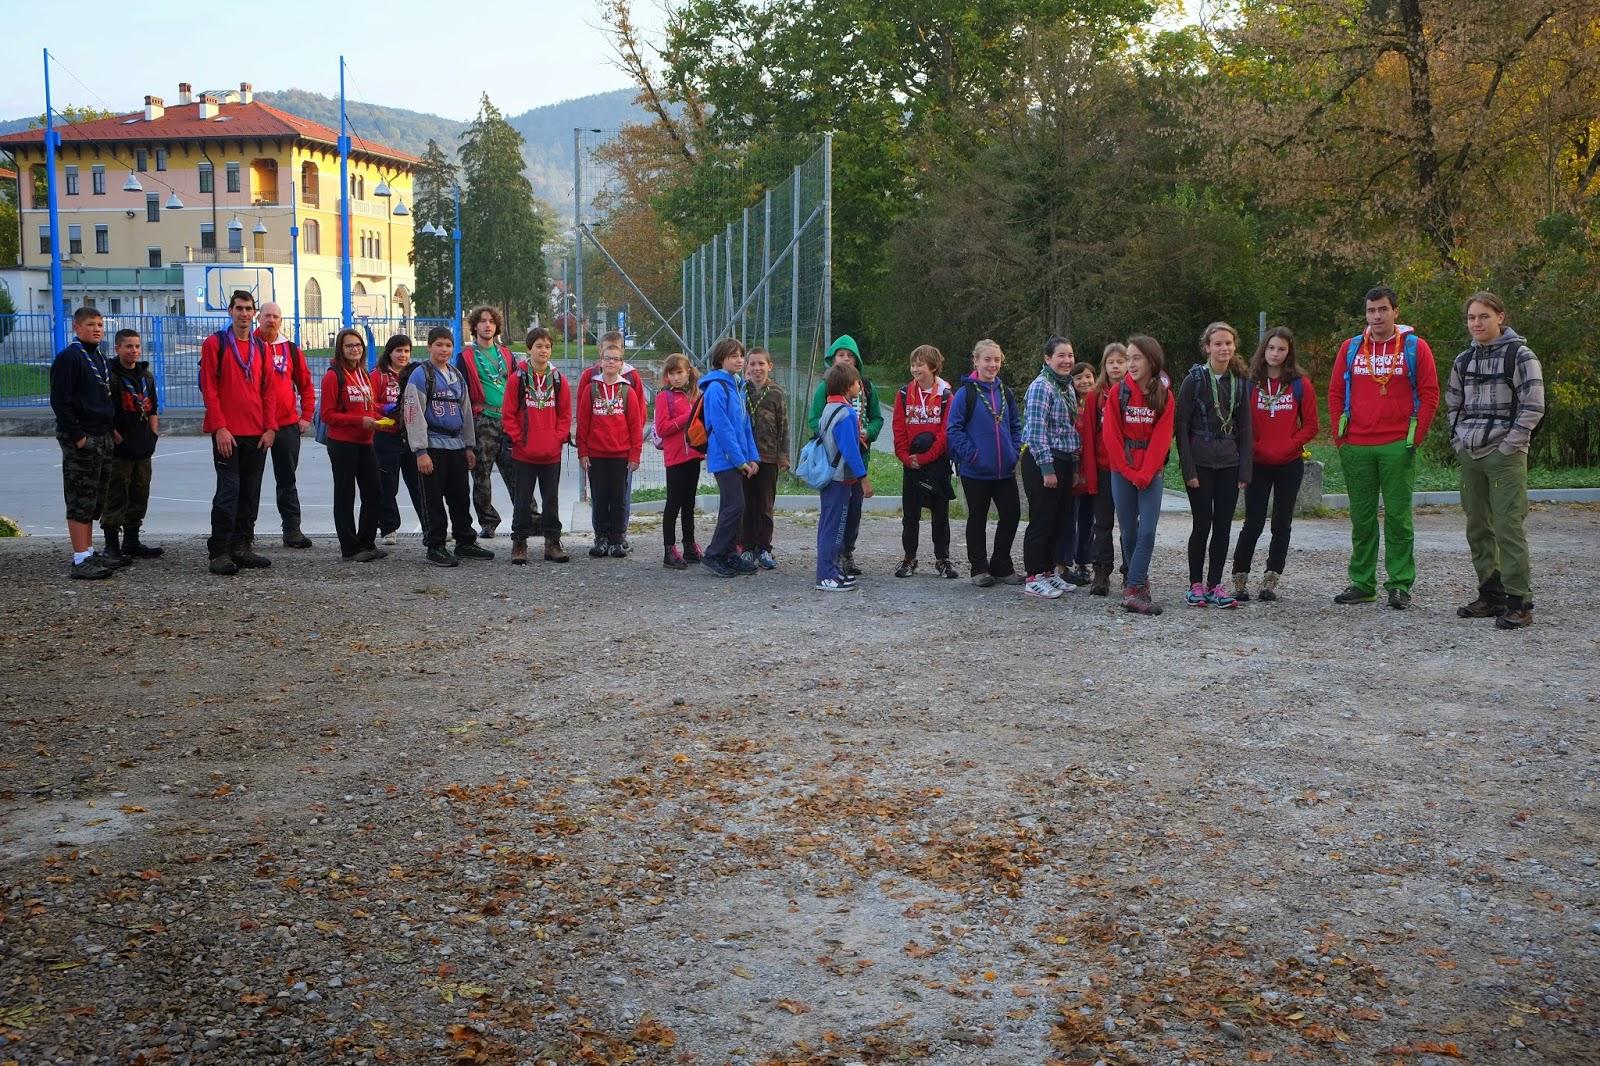 Pohod na Kozlek, Kozlek, 11.10.2014 - DSCF1075.JPG